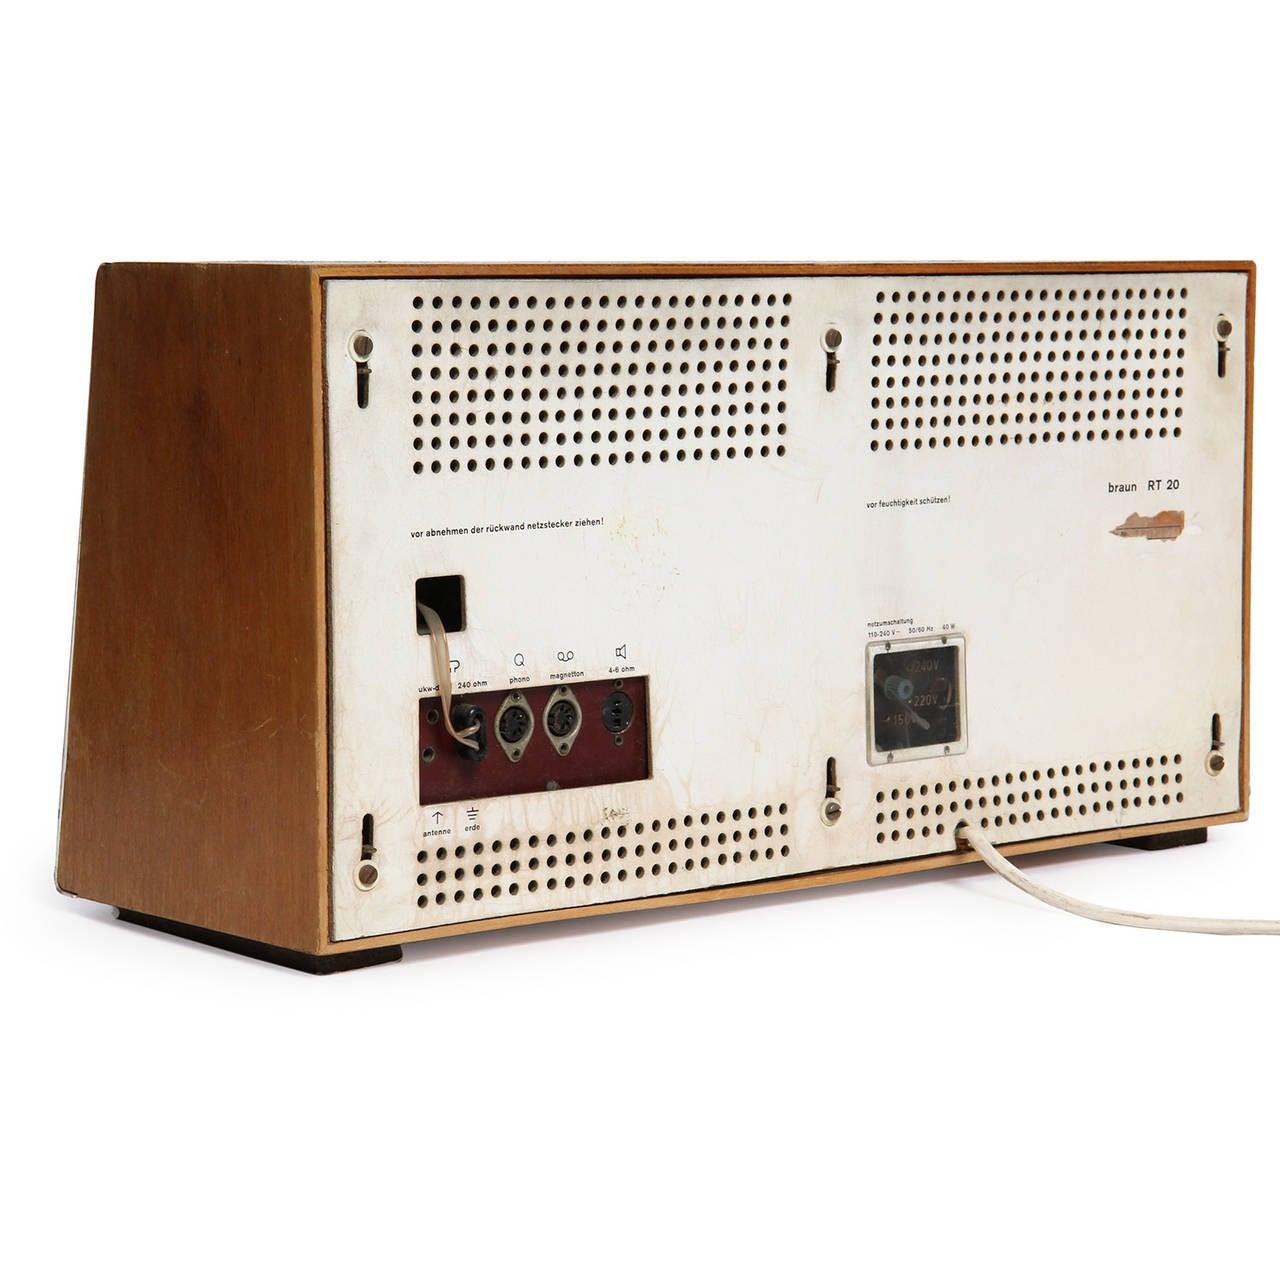 Mid-20th Century Desk Radio by Dieter Rams